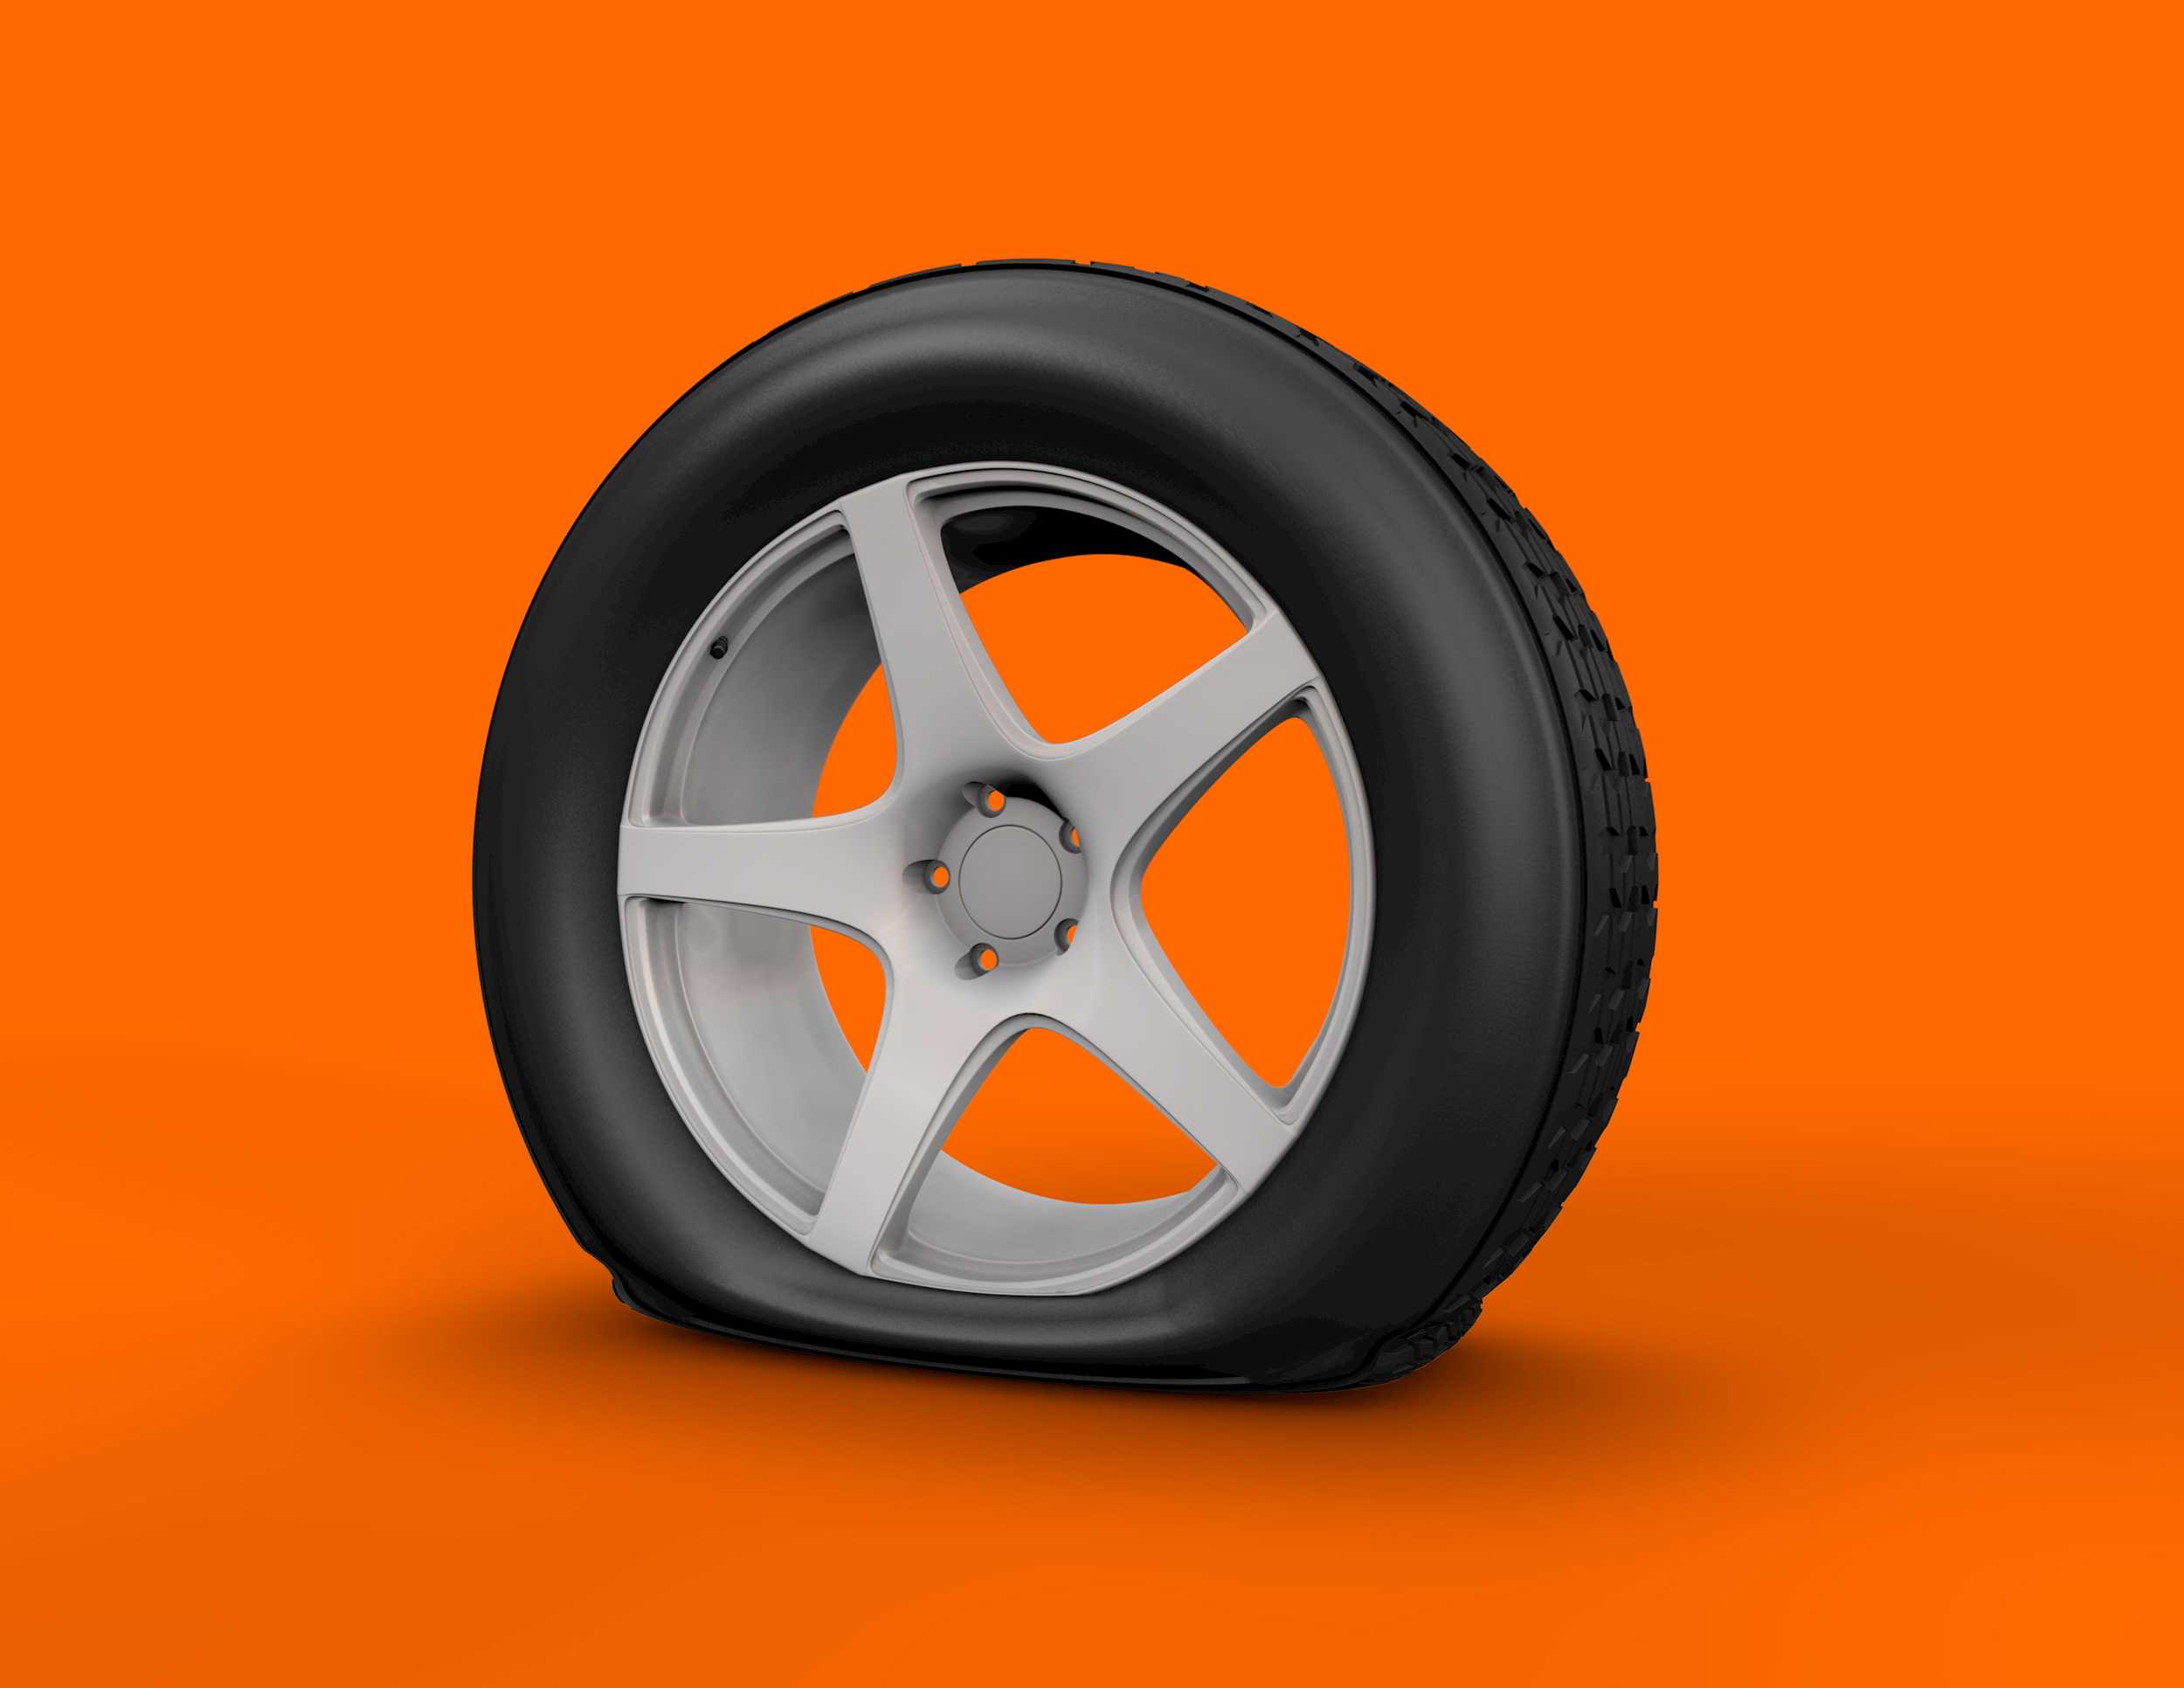 Kal-Tire-Flat-Tire